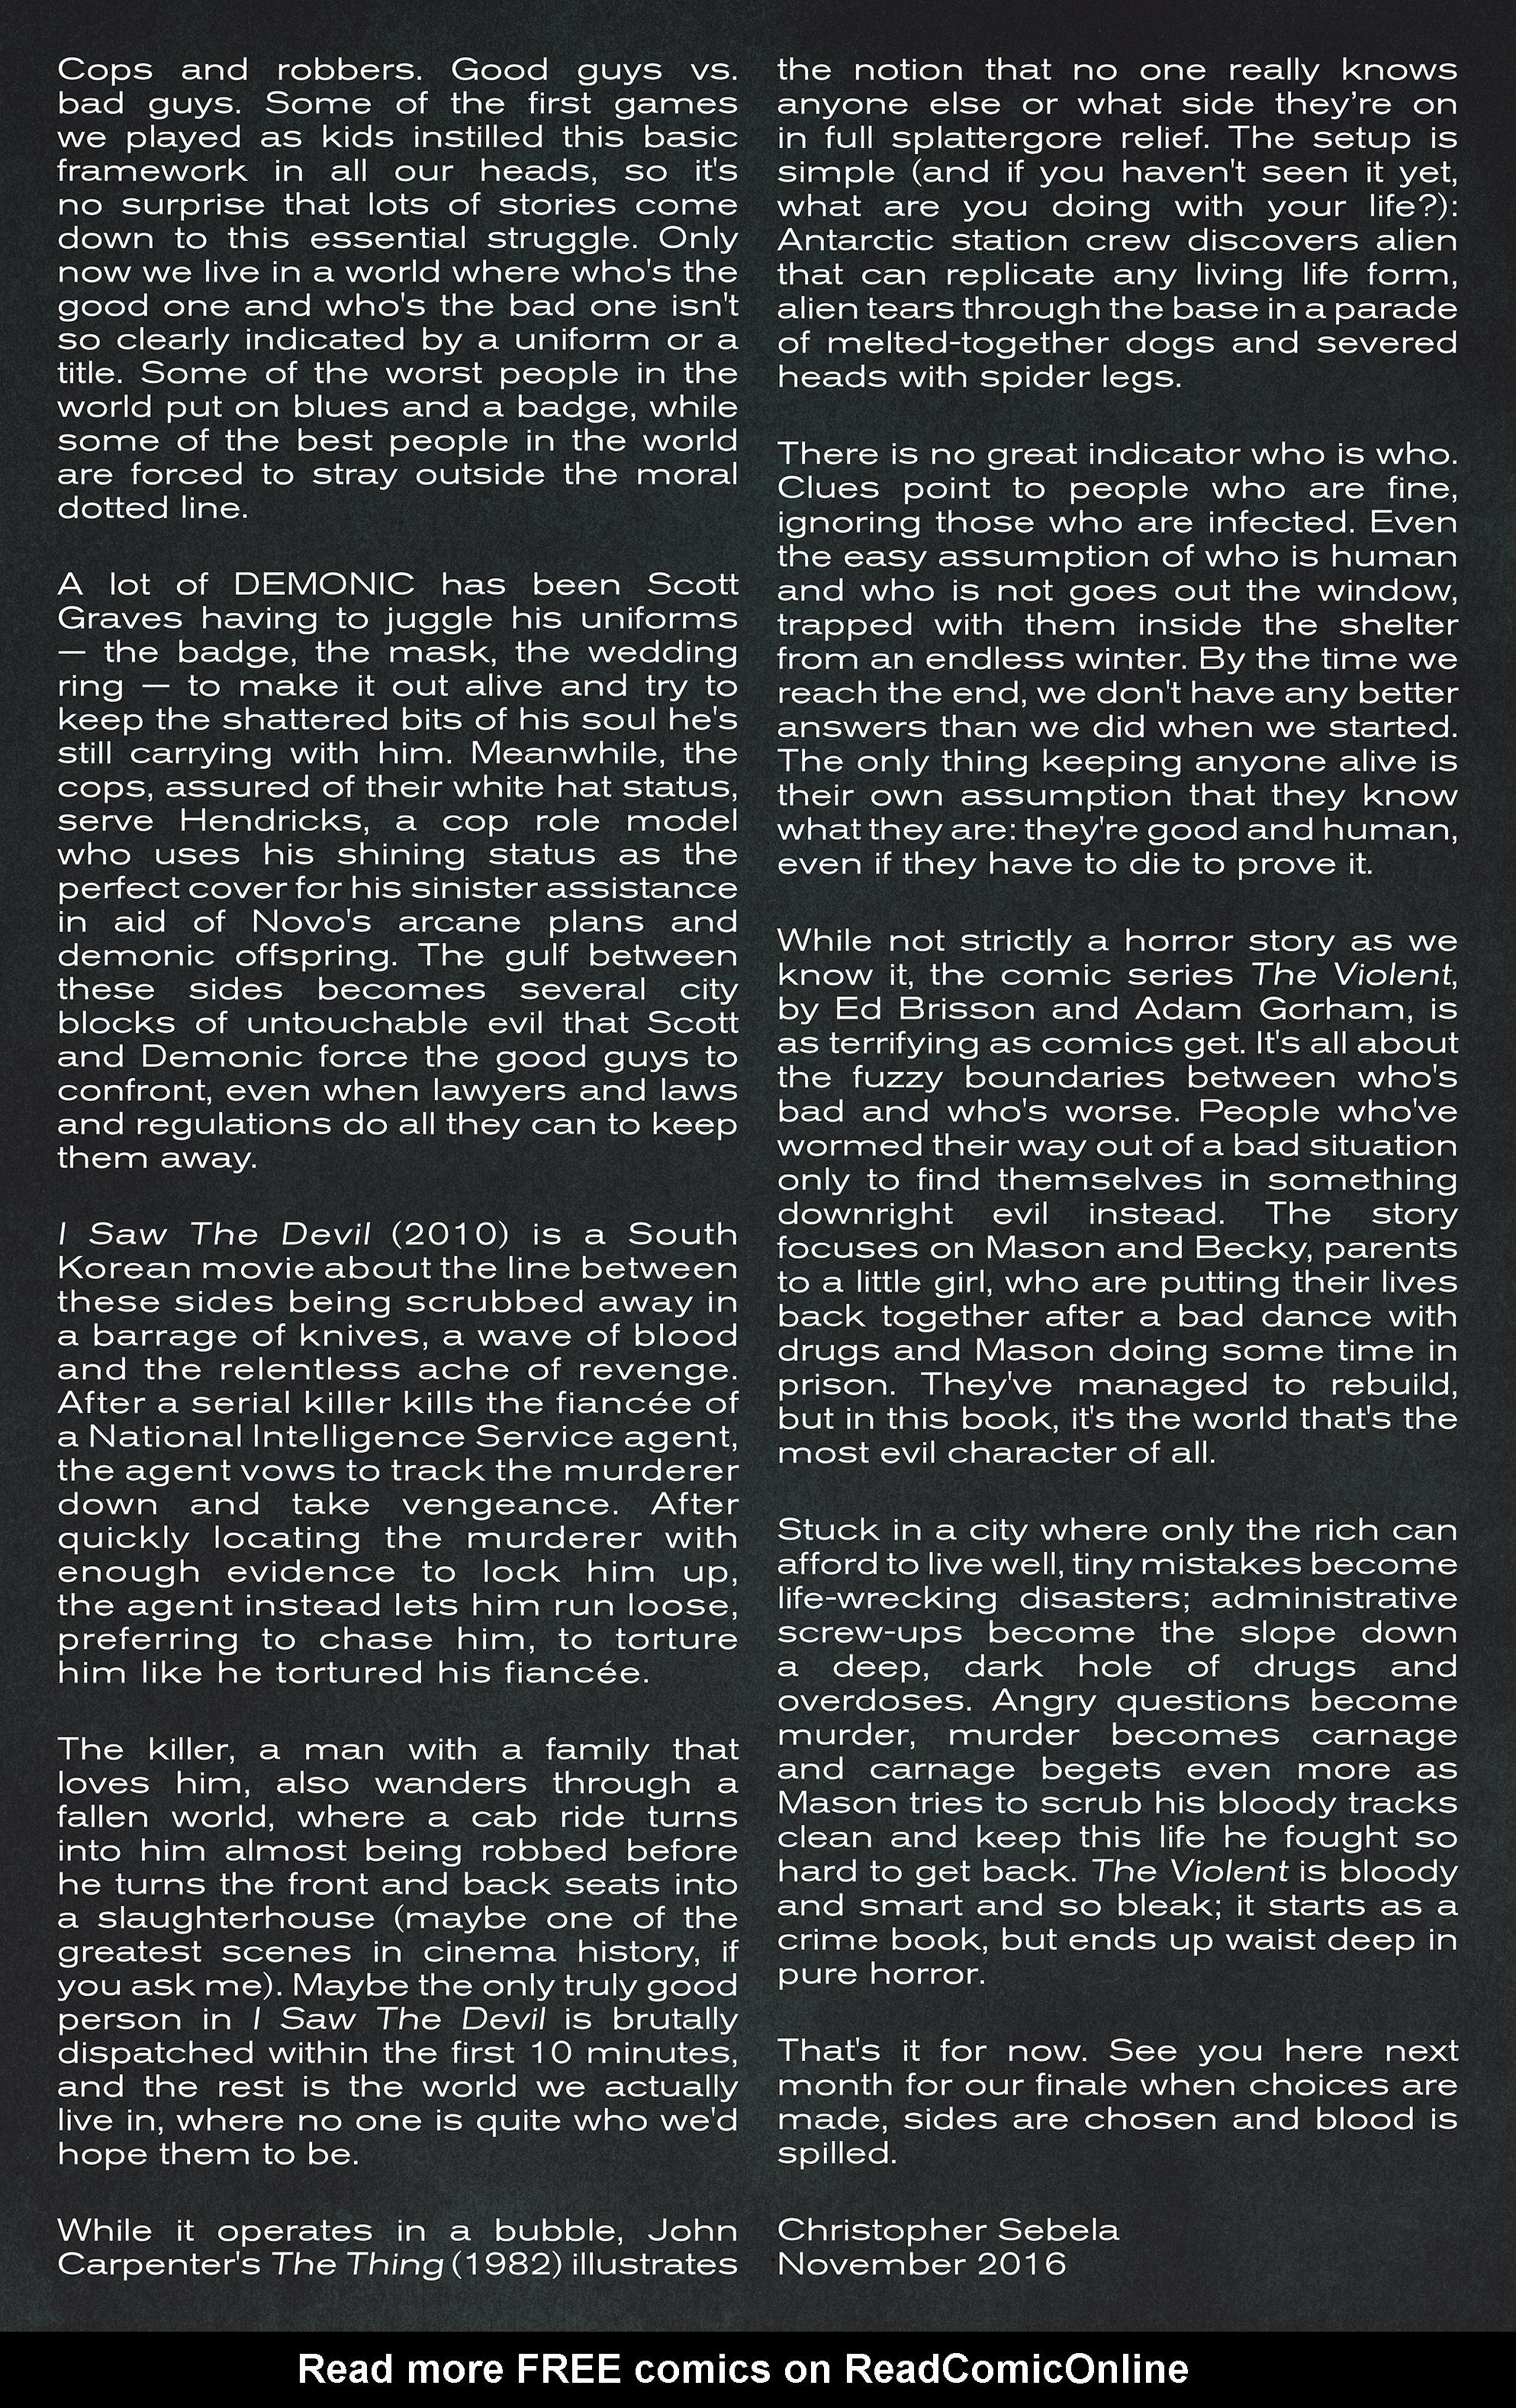 Read online Demonic comic -  Issue #5 - 23